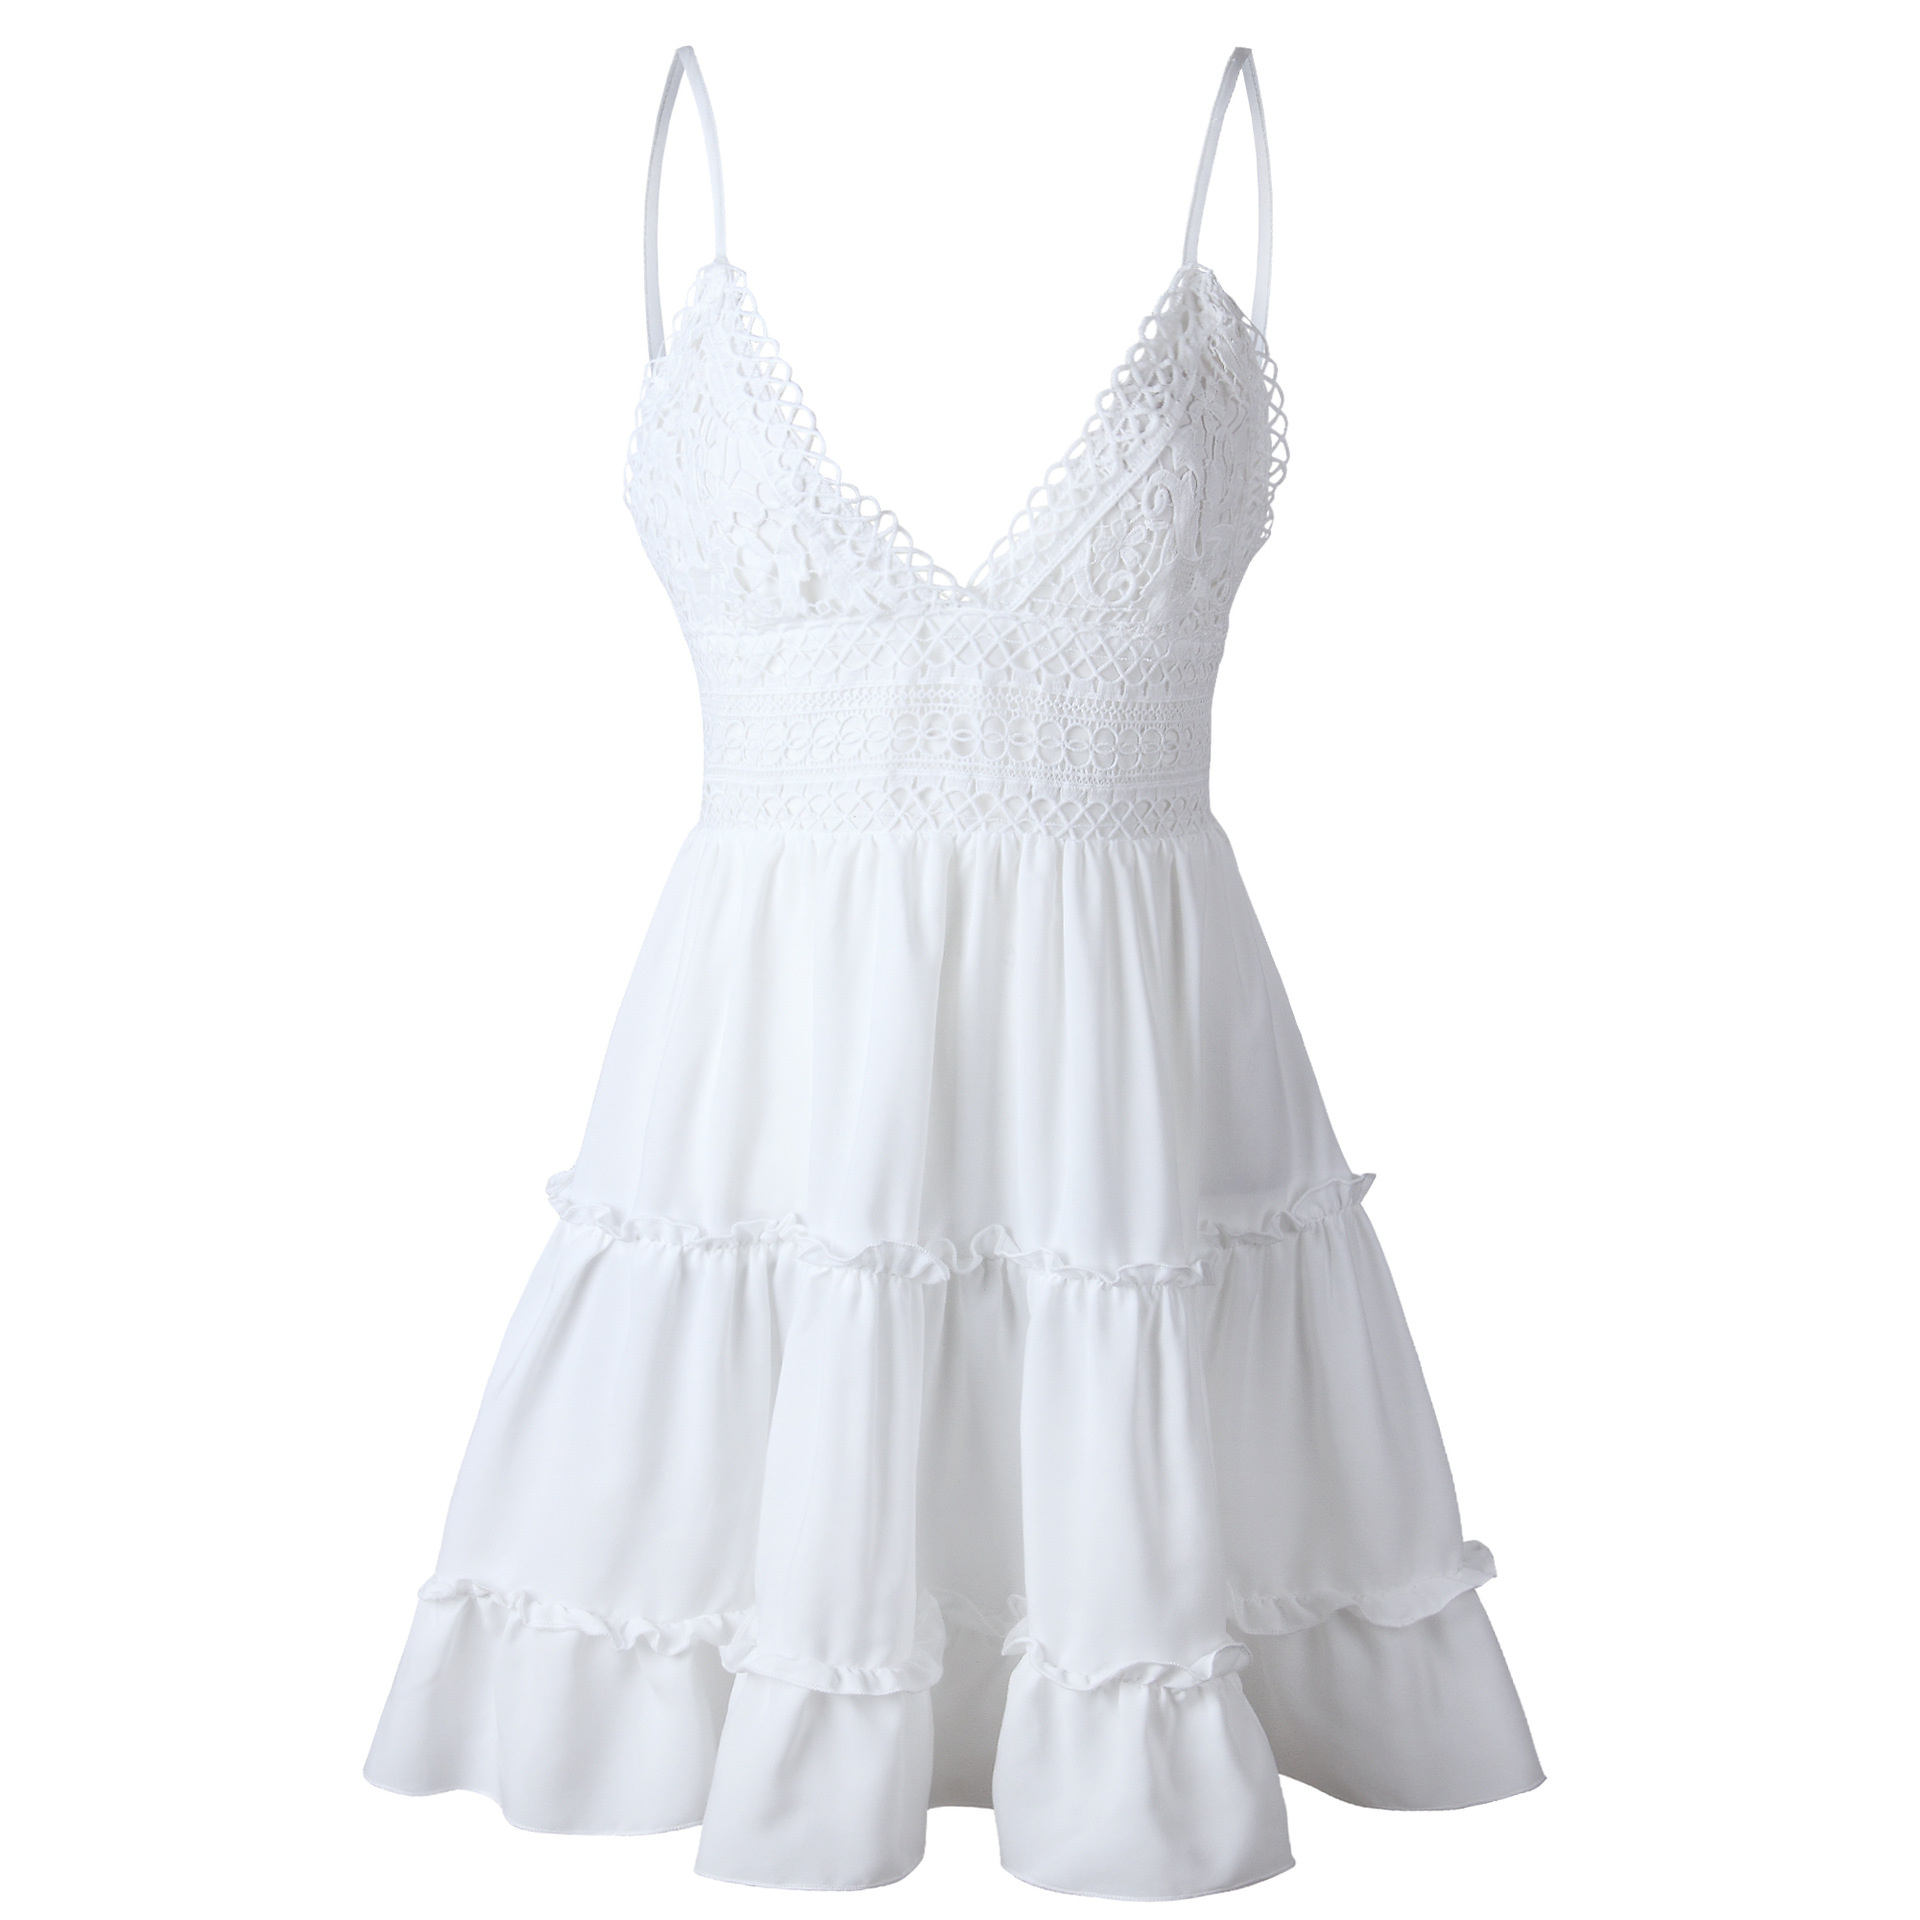 Summer Women White Lace Halter Dress Sexy Backless Beach Dresses 2020 Fashion Sleeveless Spaghetti Strap Casual Mini Sundress 1